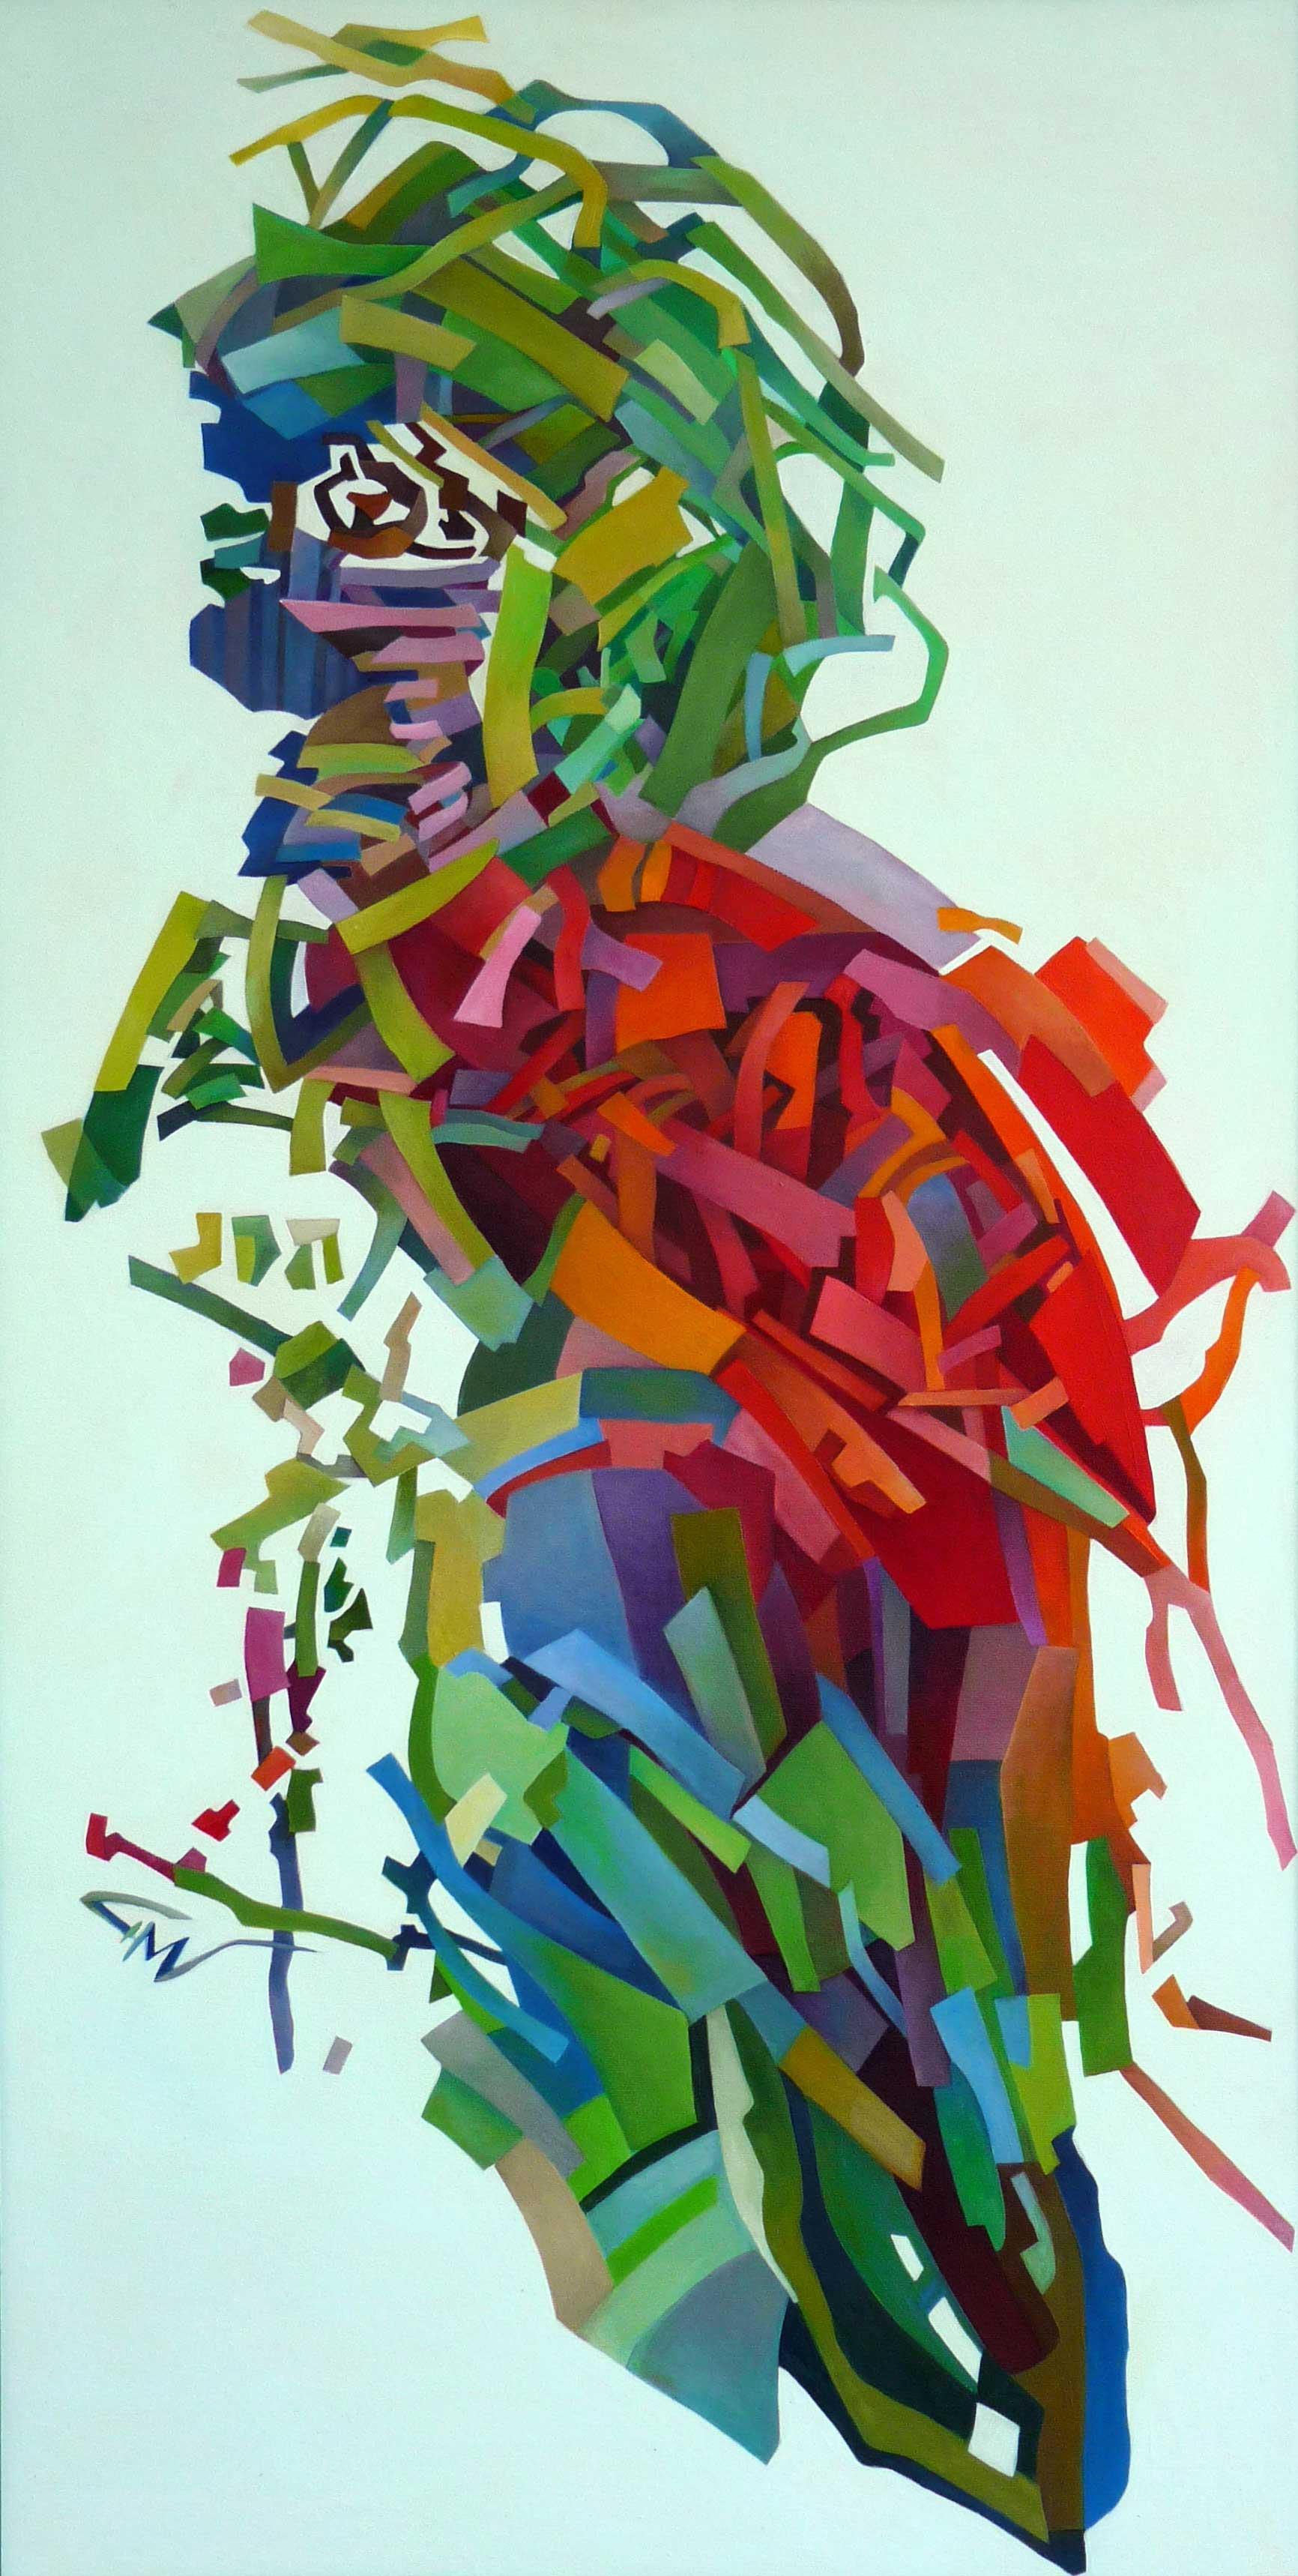 Bird Man - 120x80cm Oil on canvas